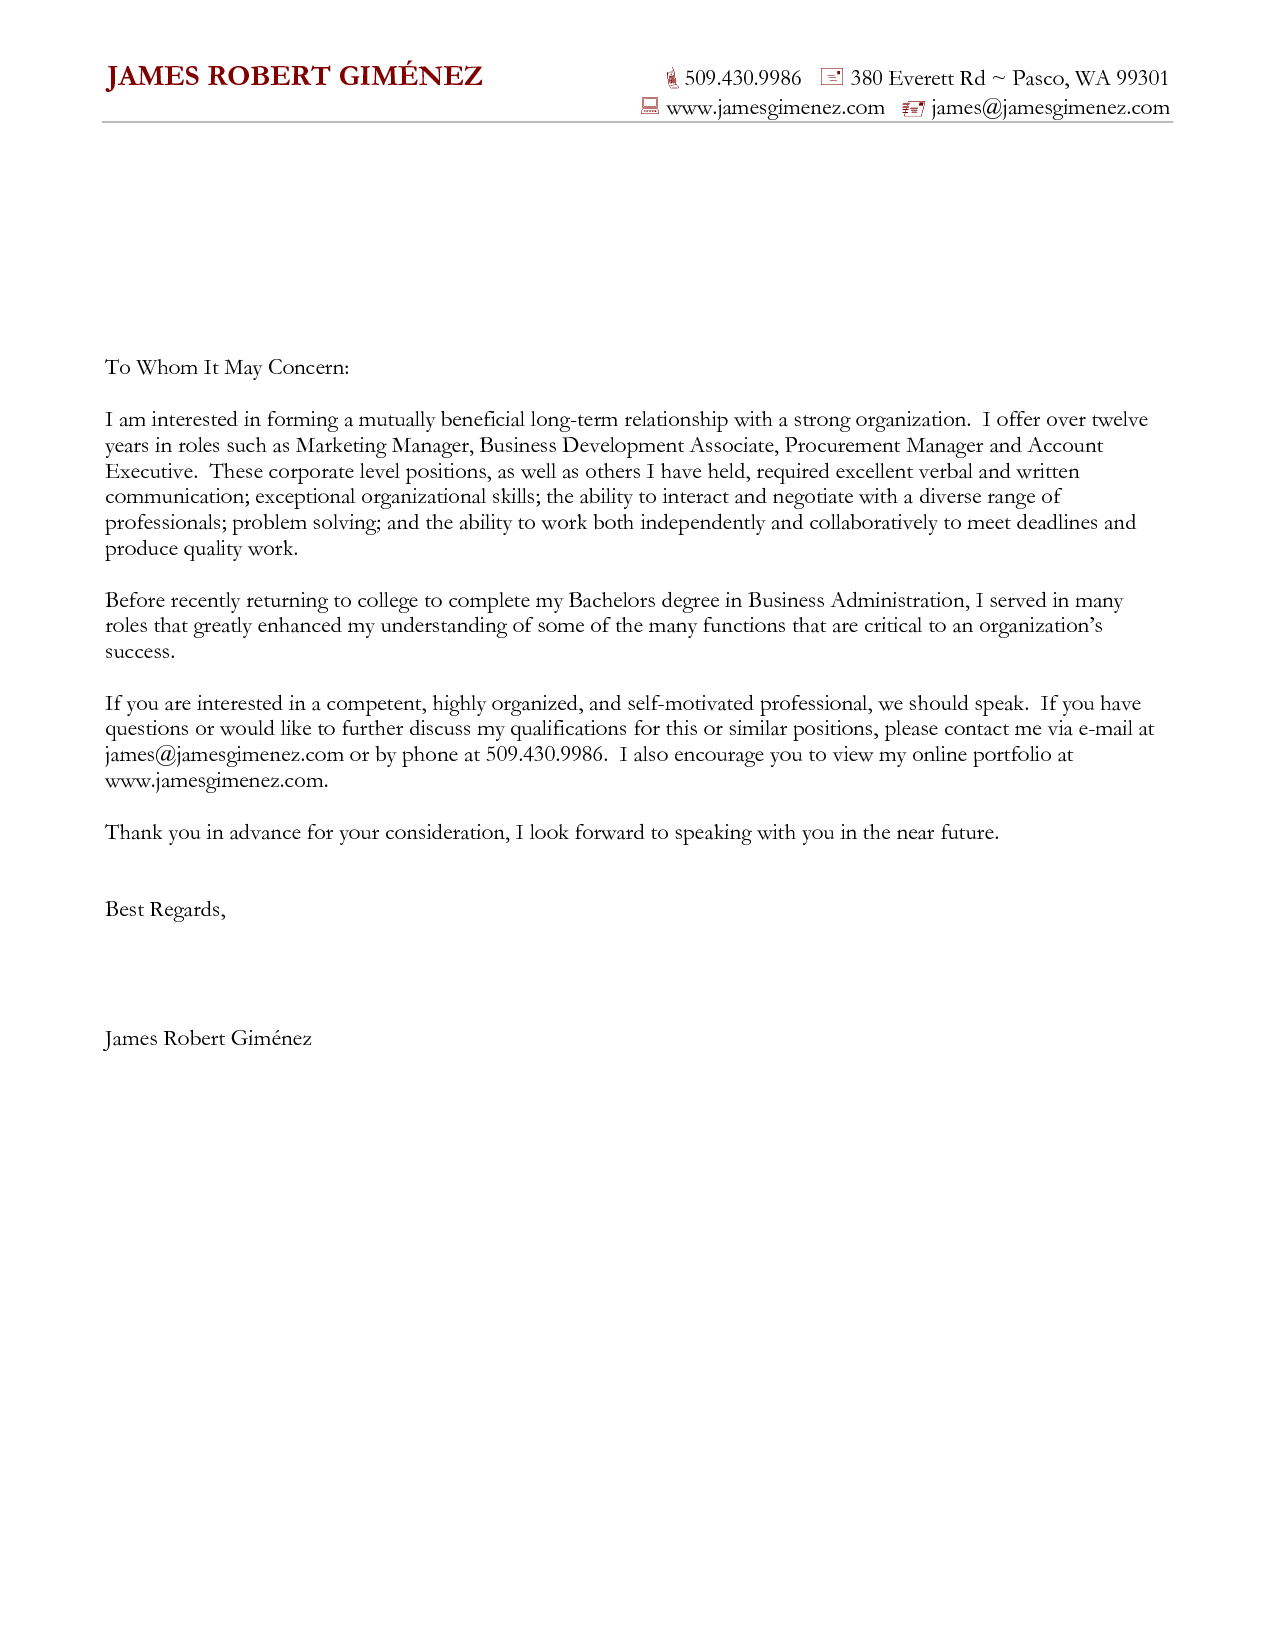 Sample Format Job Application Cover Letter